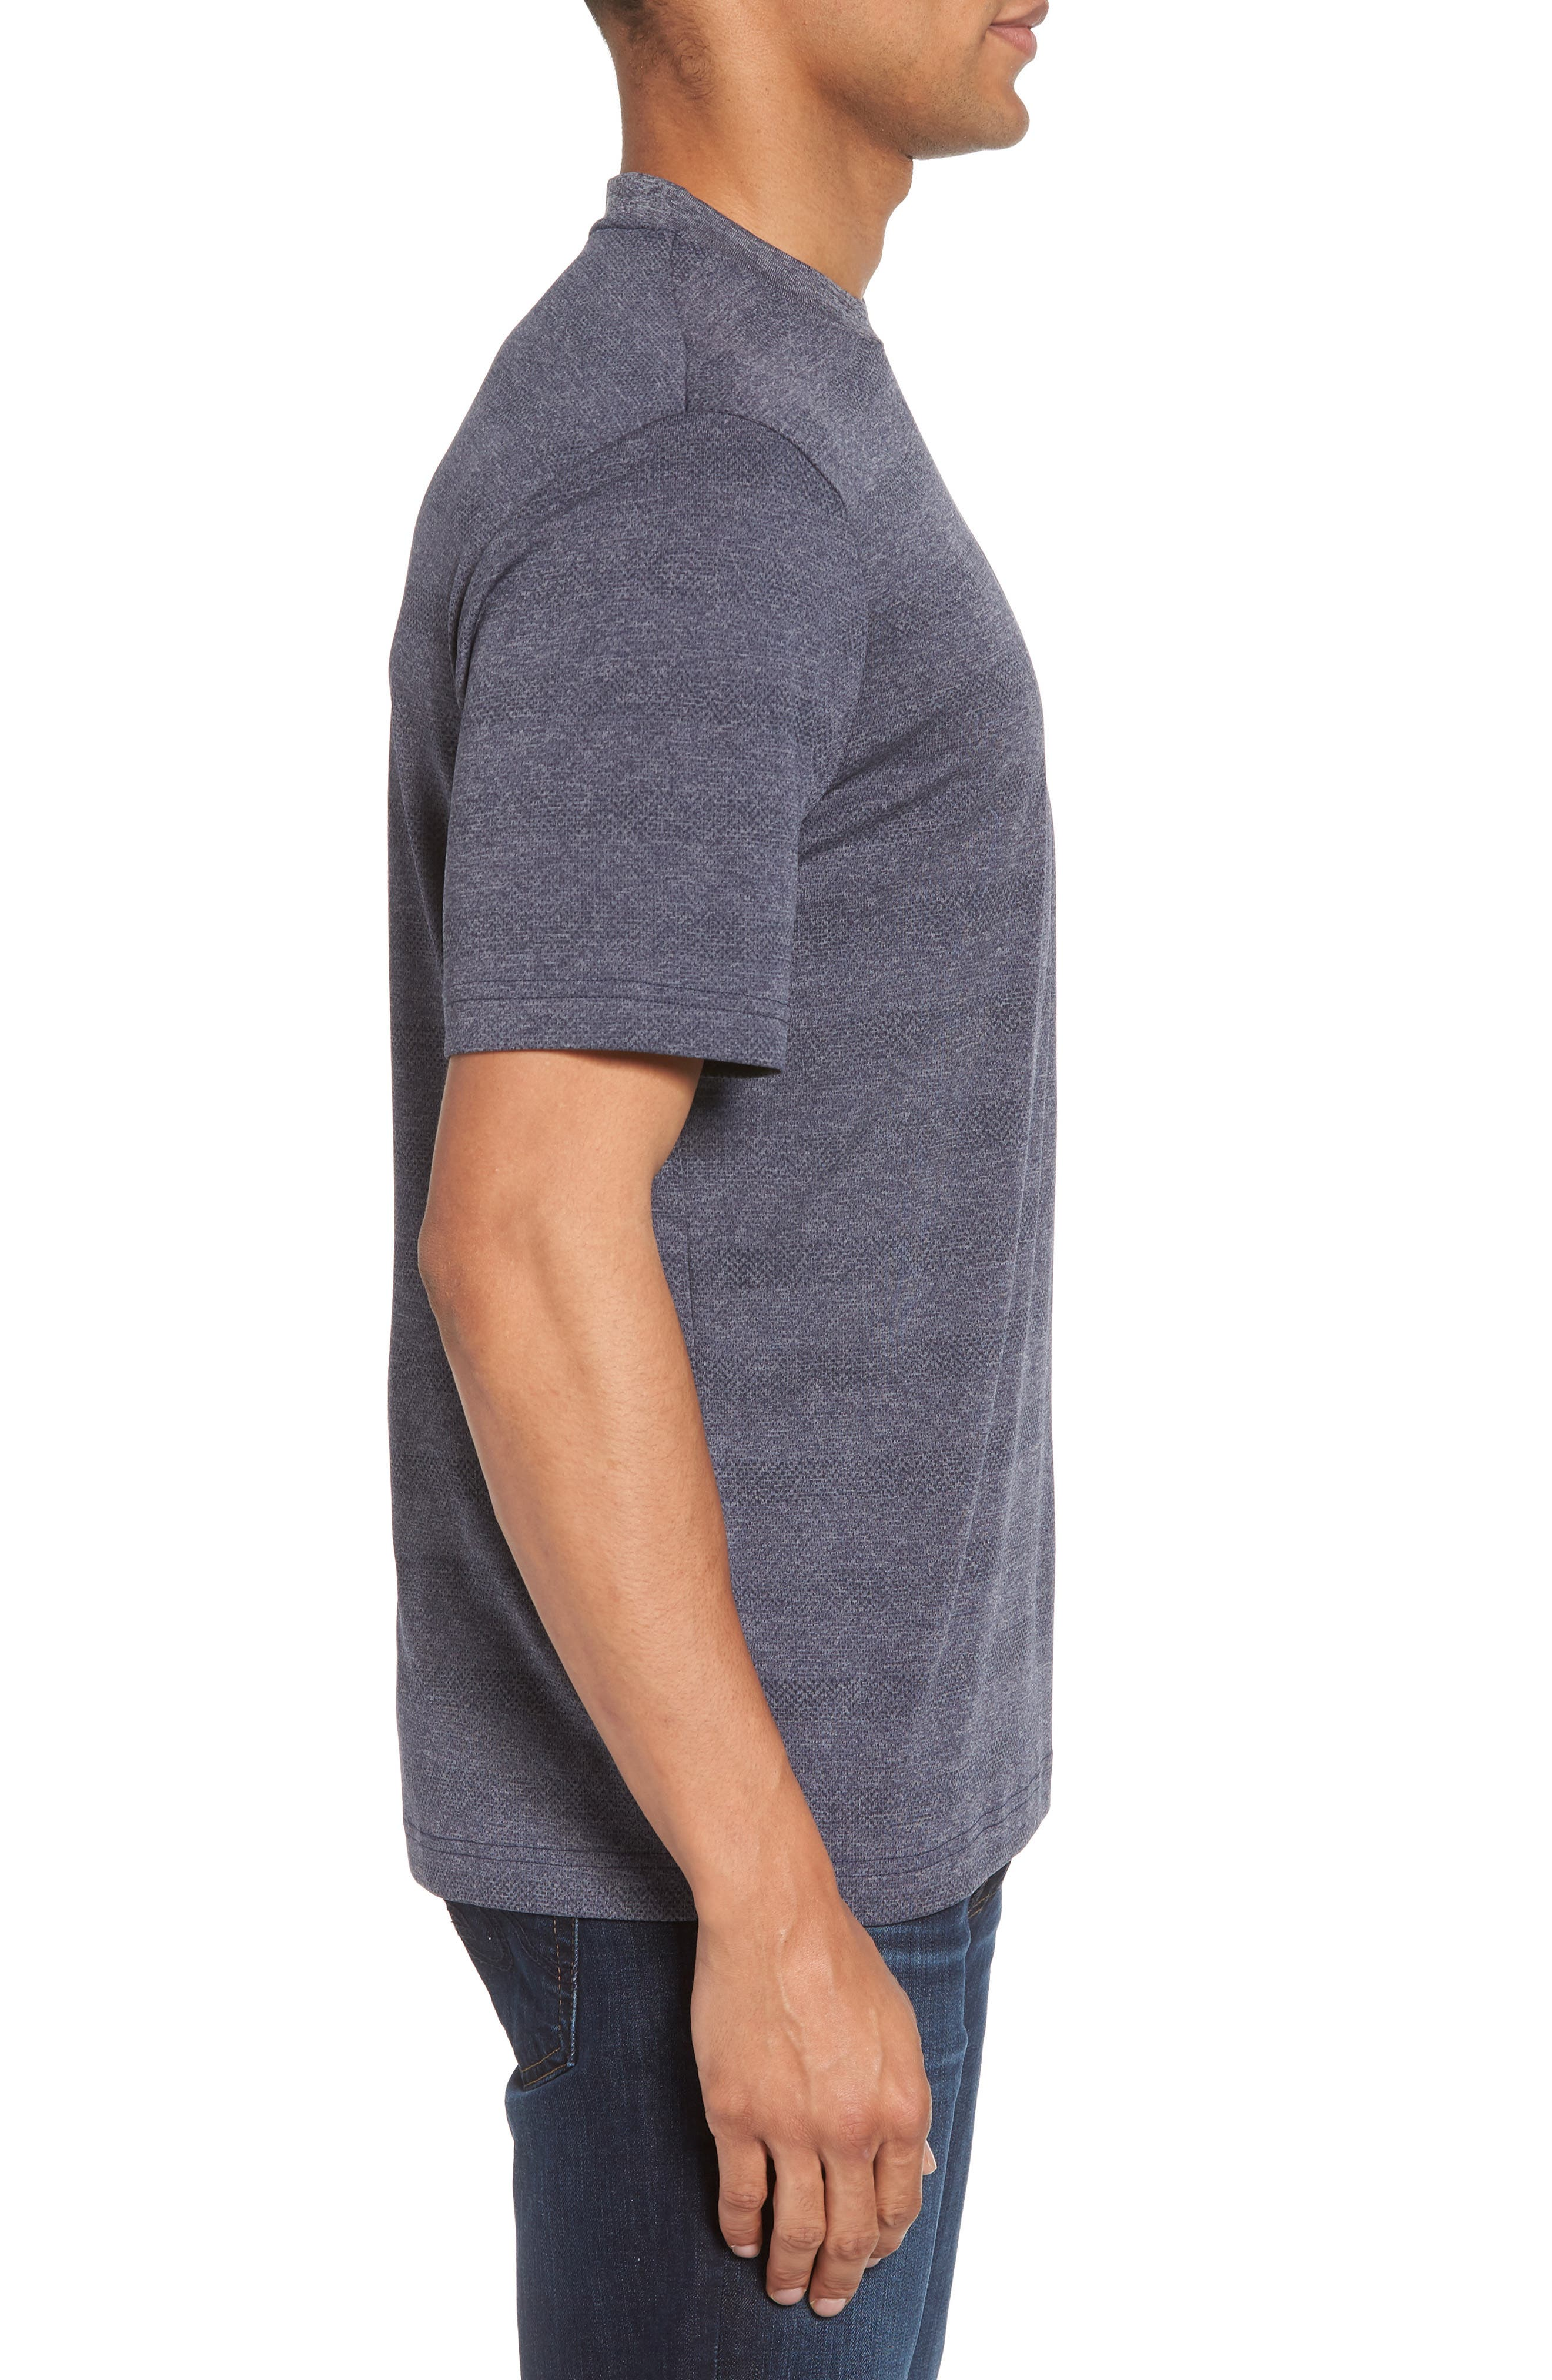 Upshift T-Shirt,                             Alternate thumbnail 3, color,                             HEATHER GRIFFIN